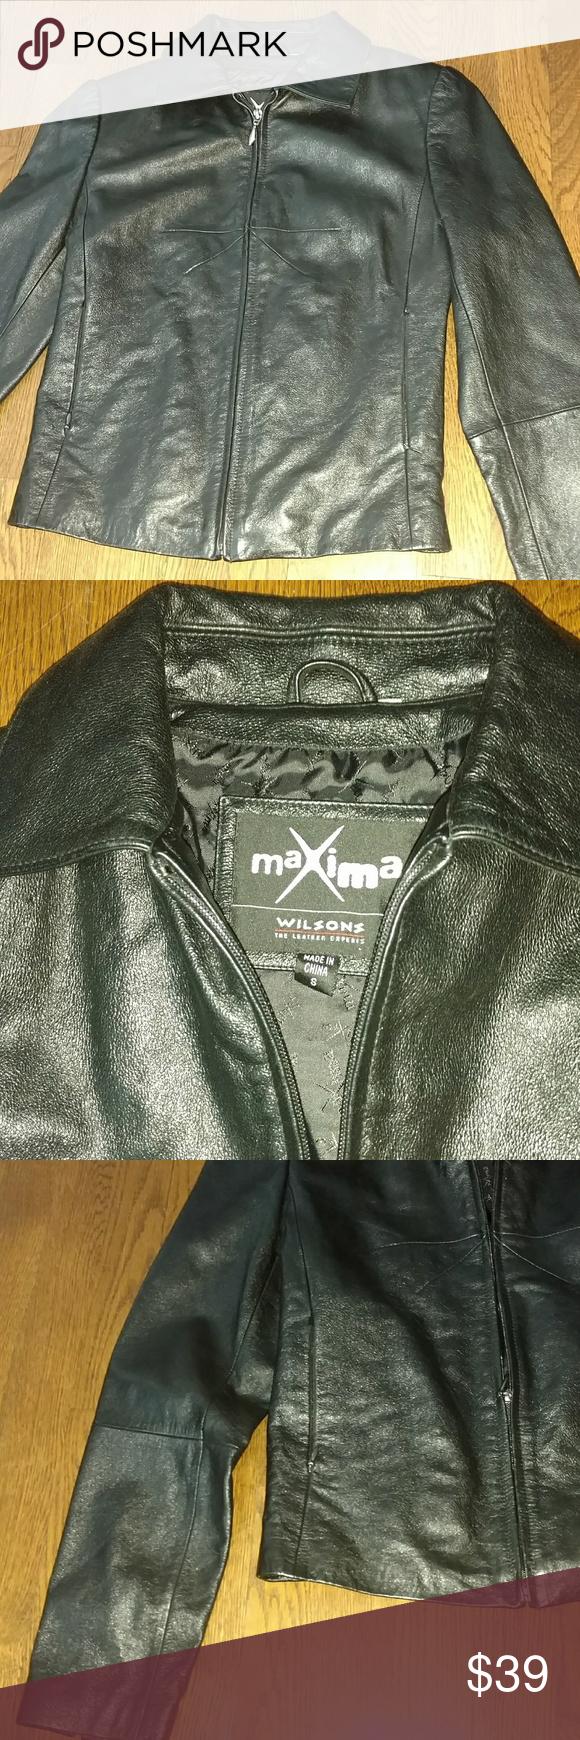 Wilsons maxima leather jacket Leather jacket, Wilsons